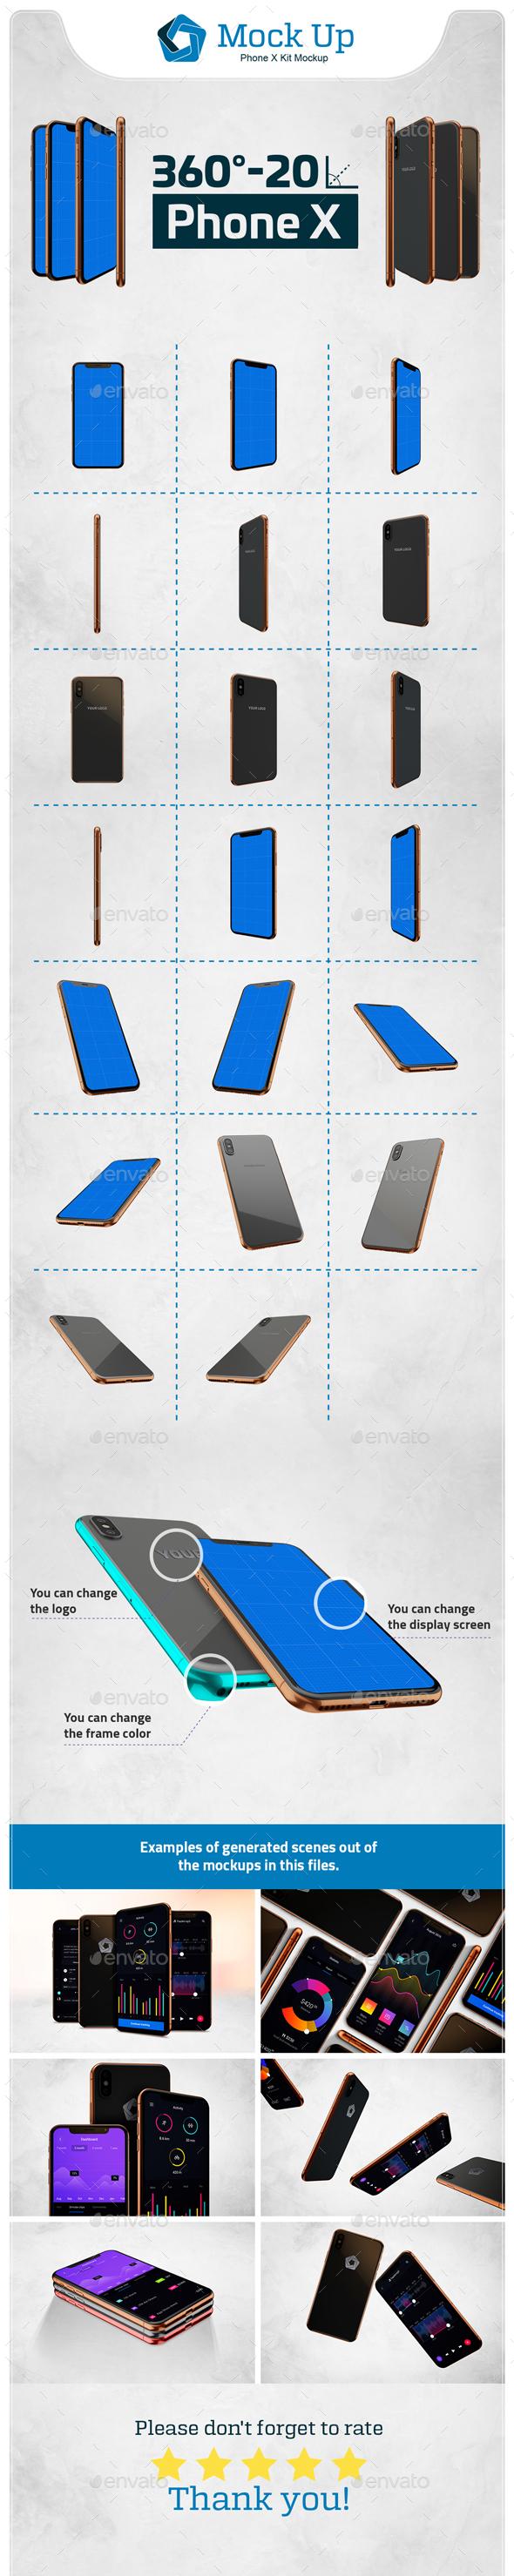 Phone X Kit Mockup - Product Mock-Ups Graphics